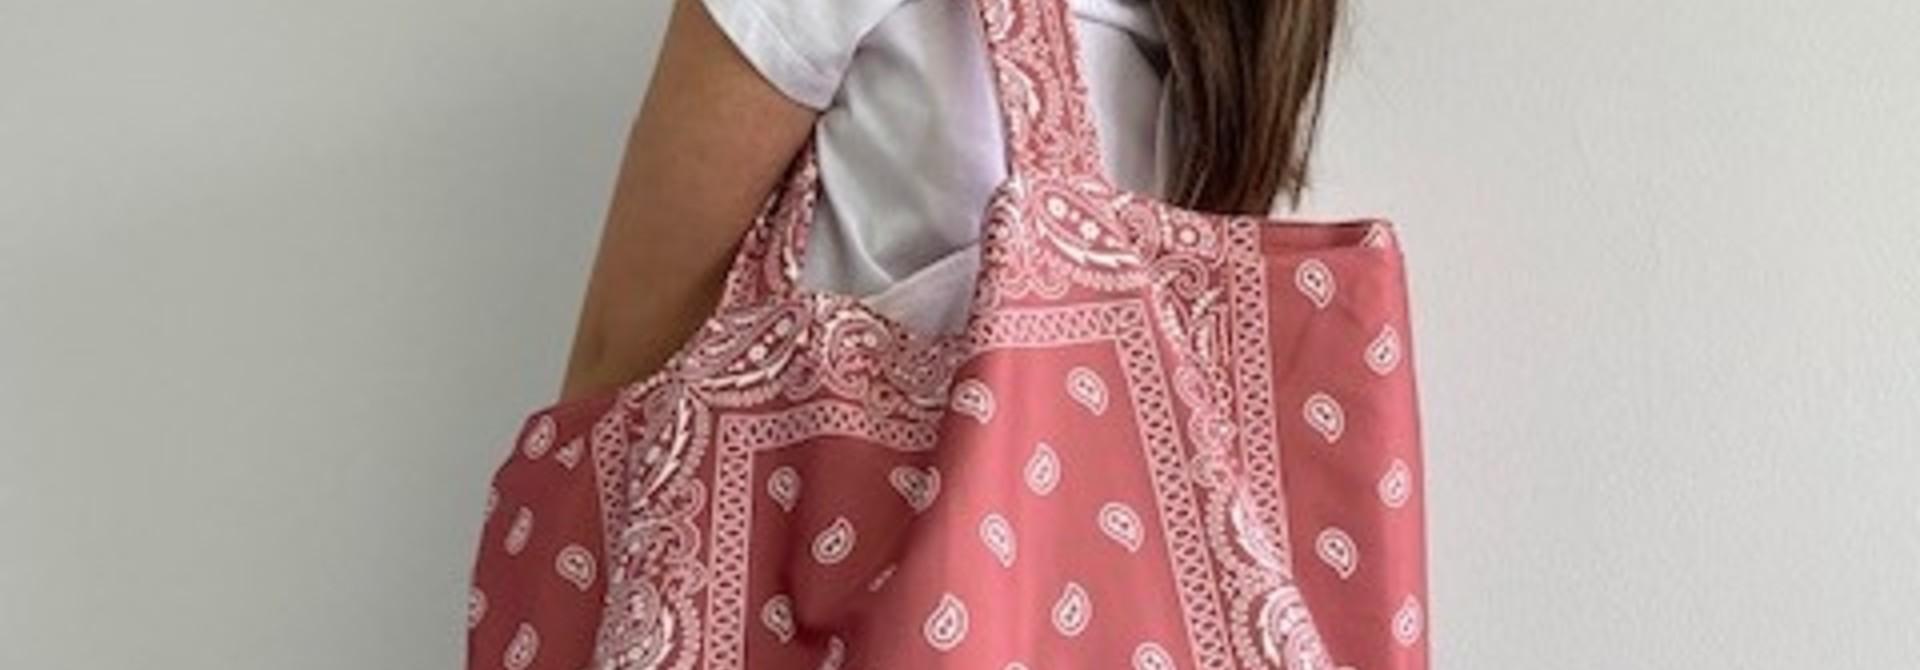 Kaylee satin bandana shopper Blush